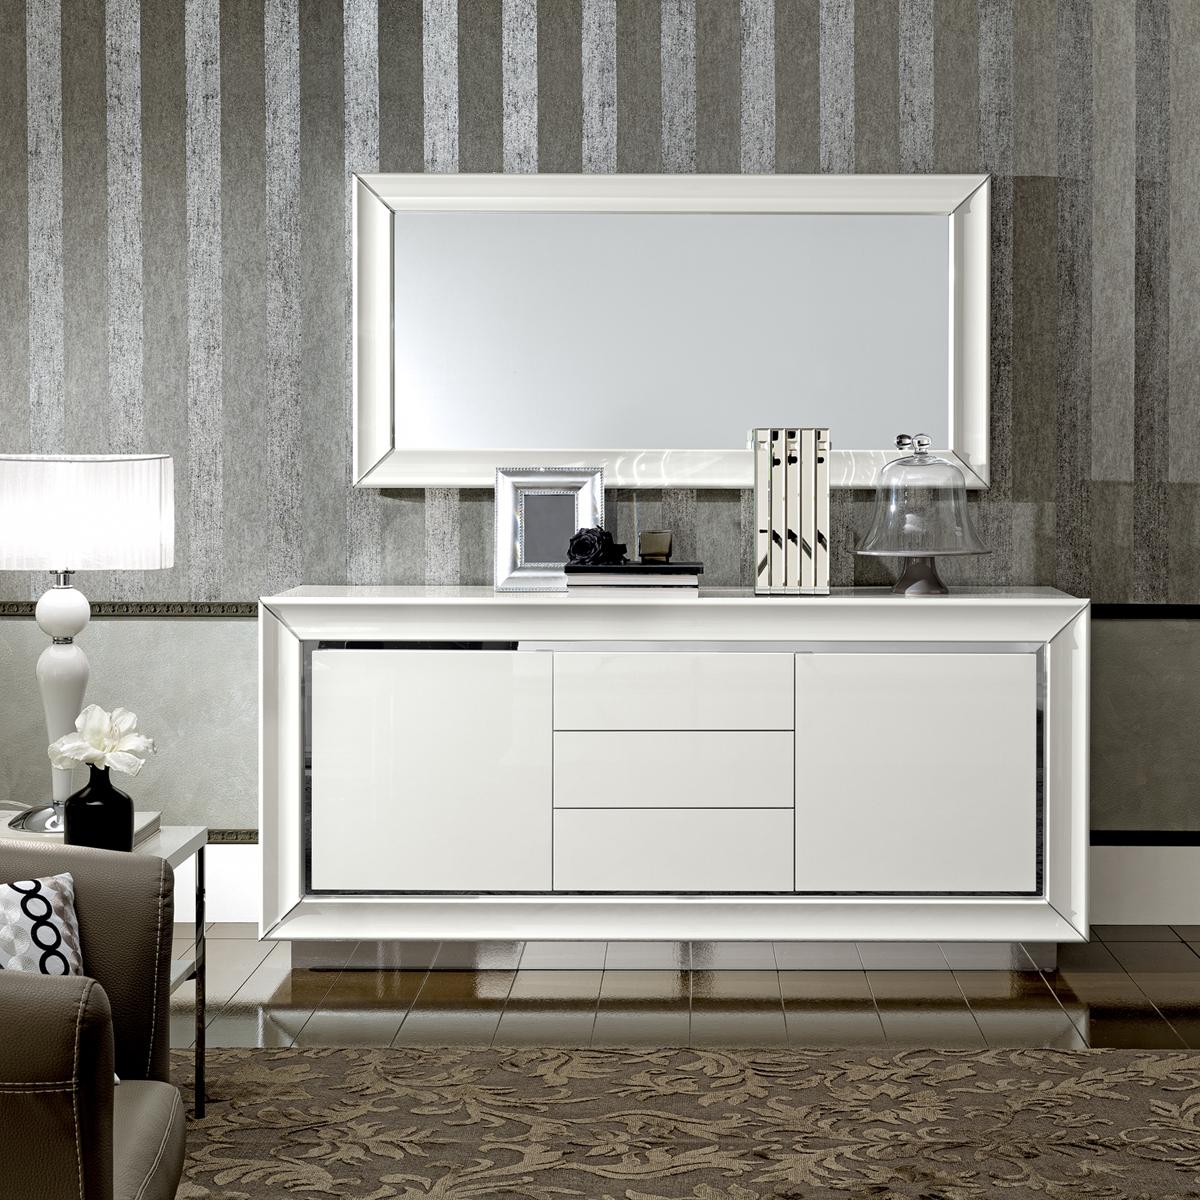 Dama Bianca Dining, Modern Formal Dining Sets, Dining Room